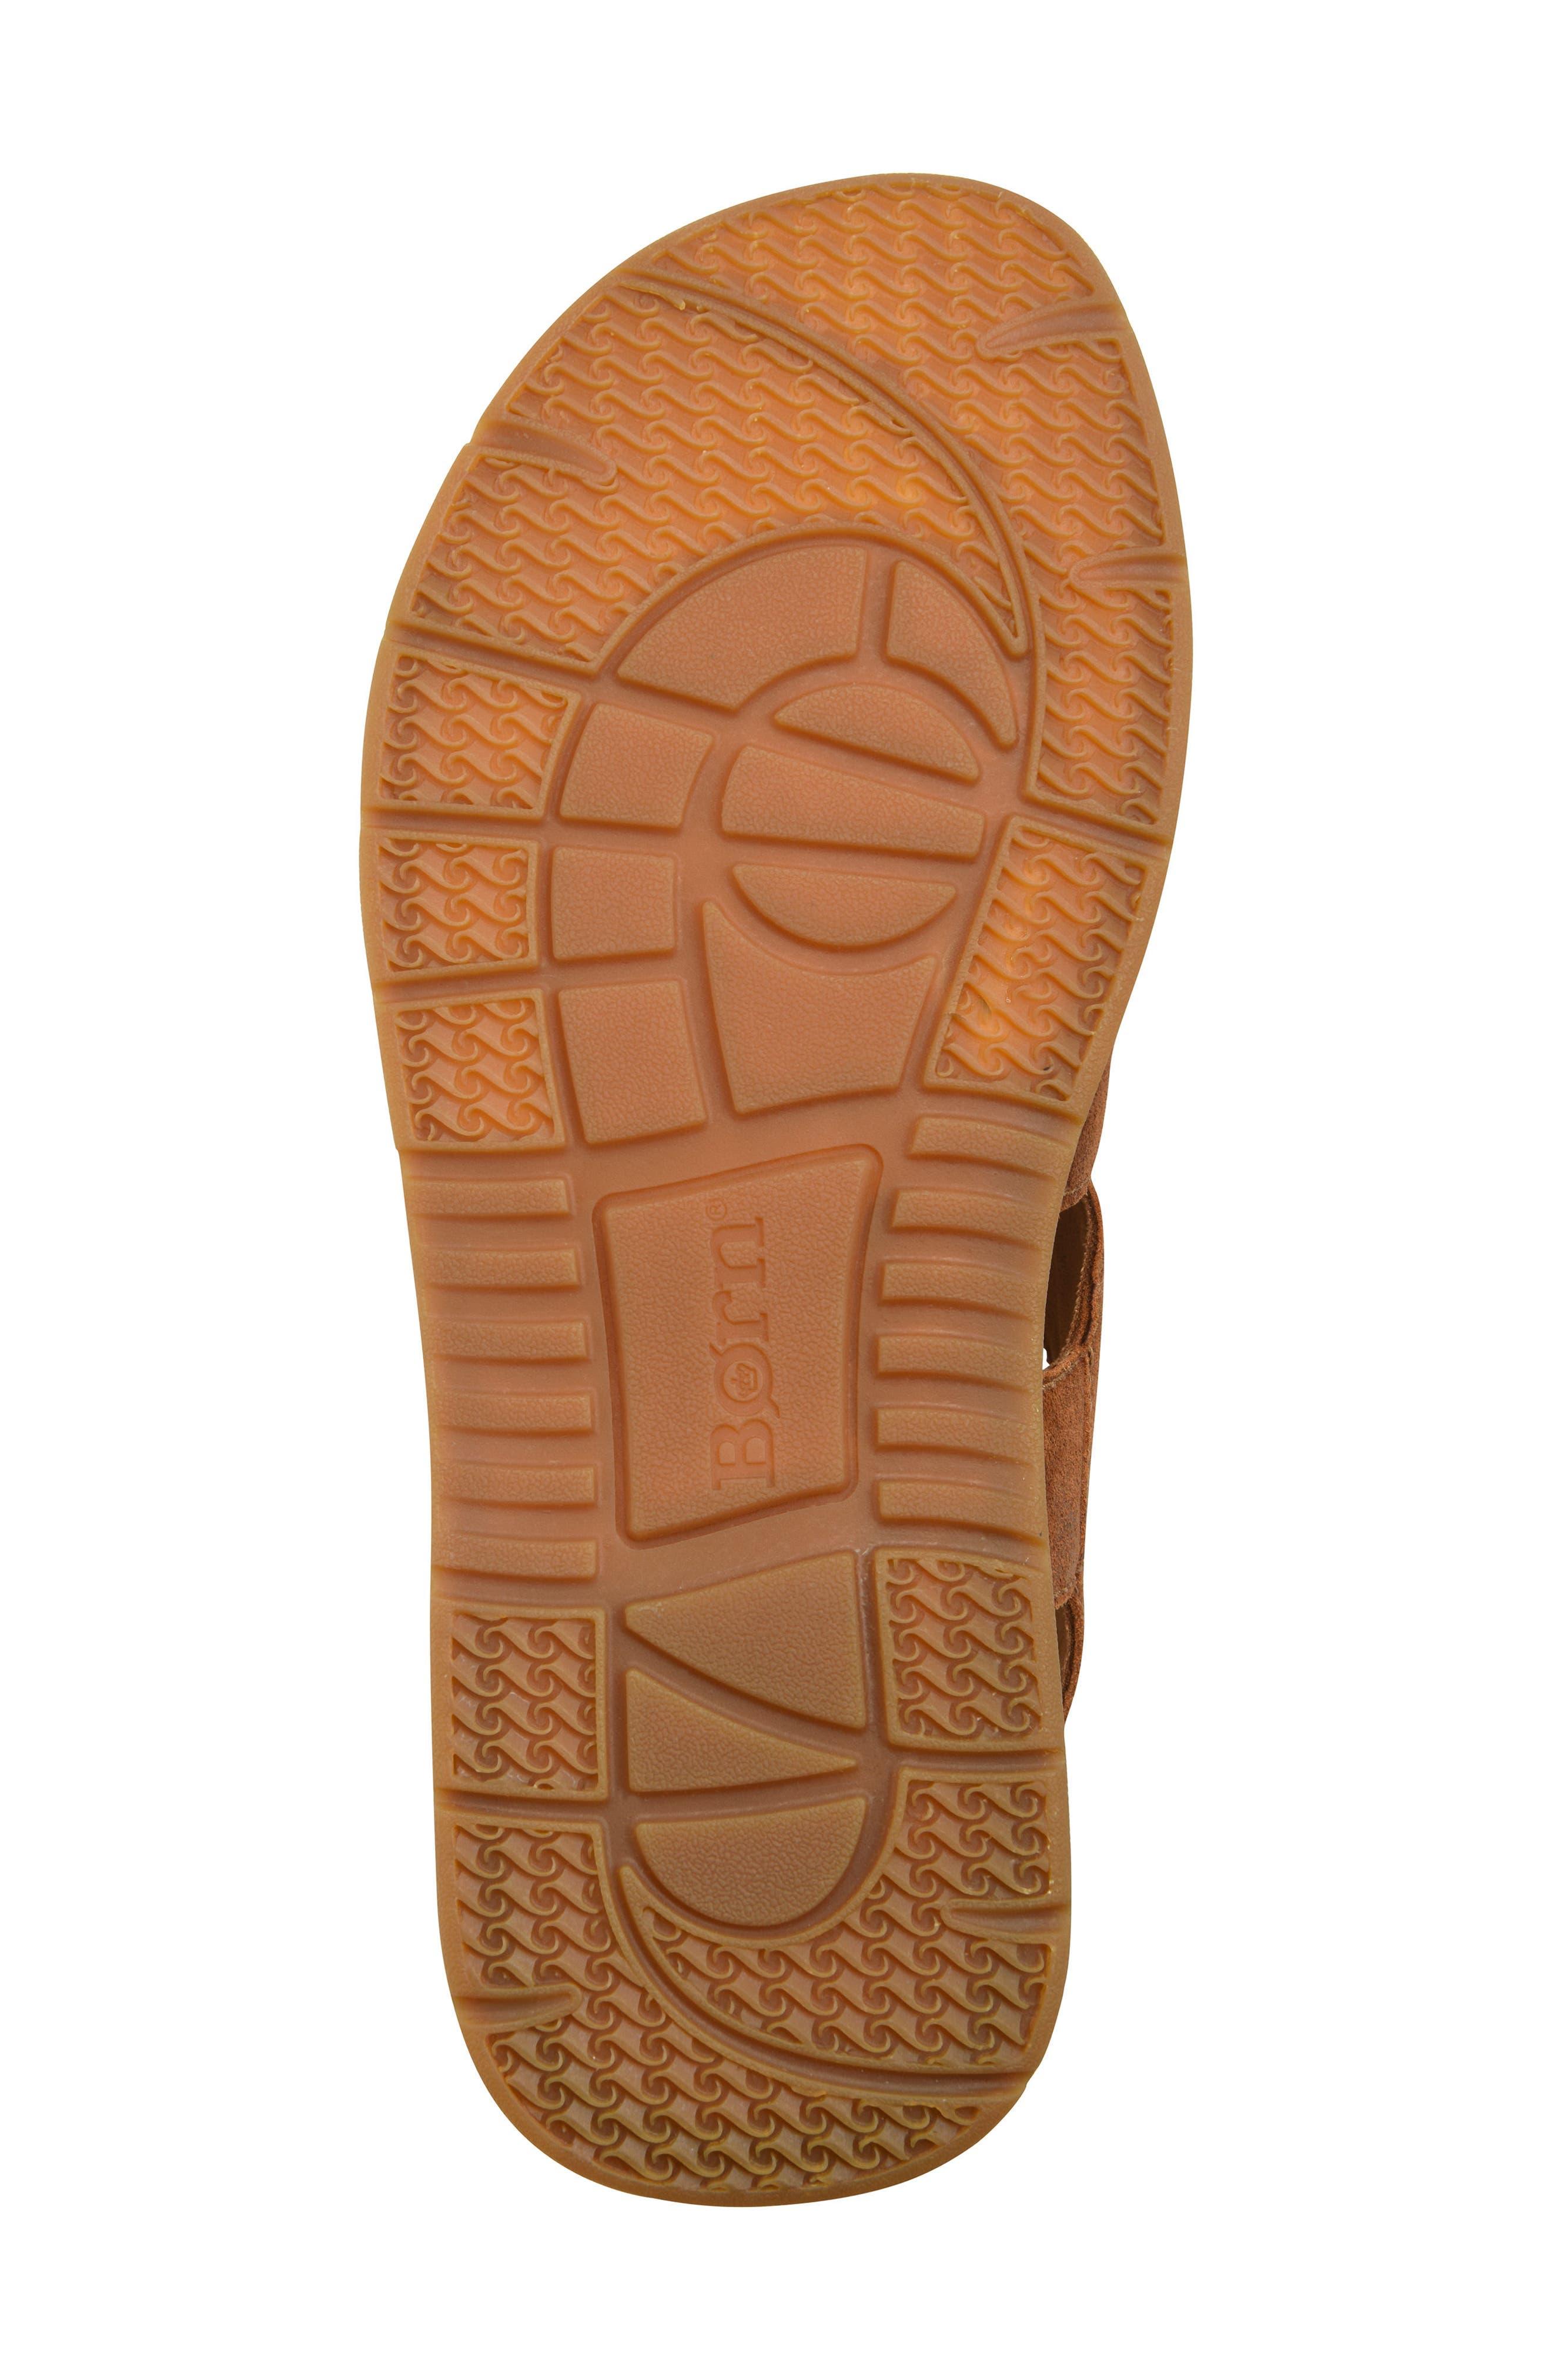 Shell Cross Strap Sandal,                             Alternate thumbnail 6, color,                             Rust Leather